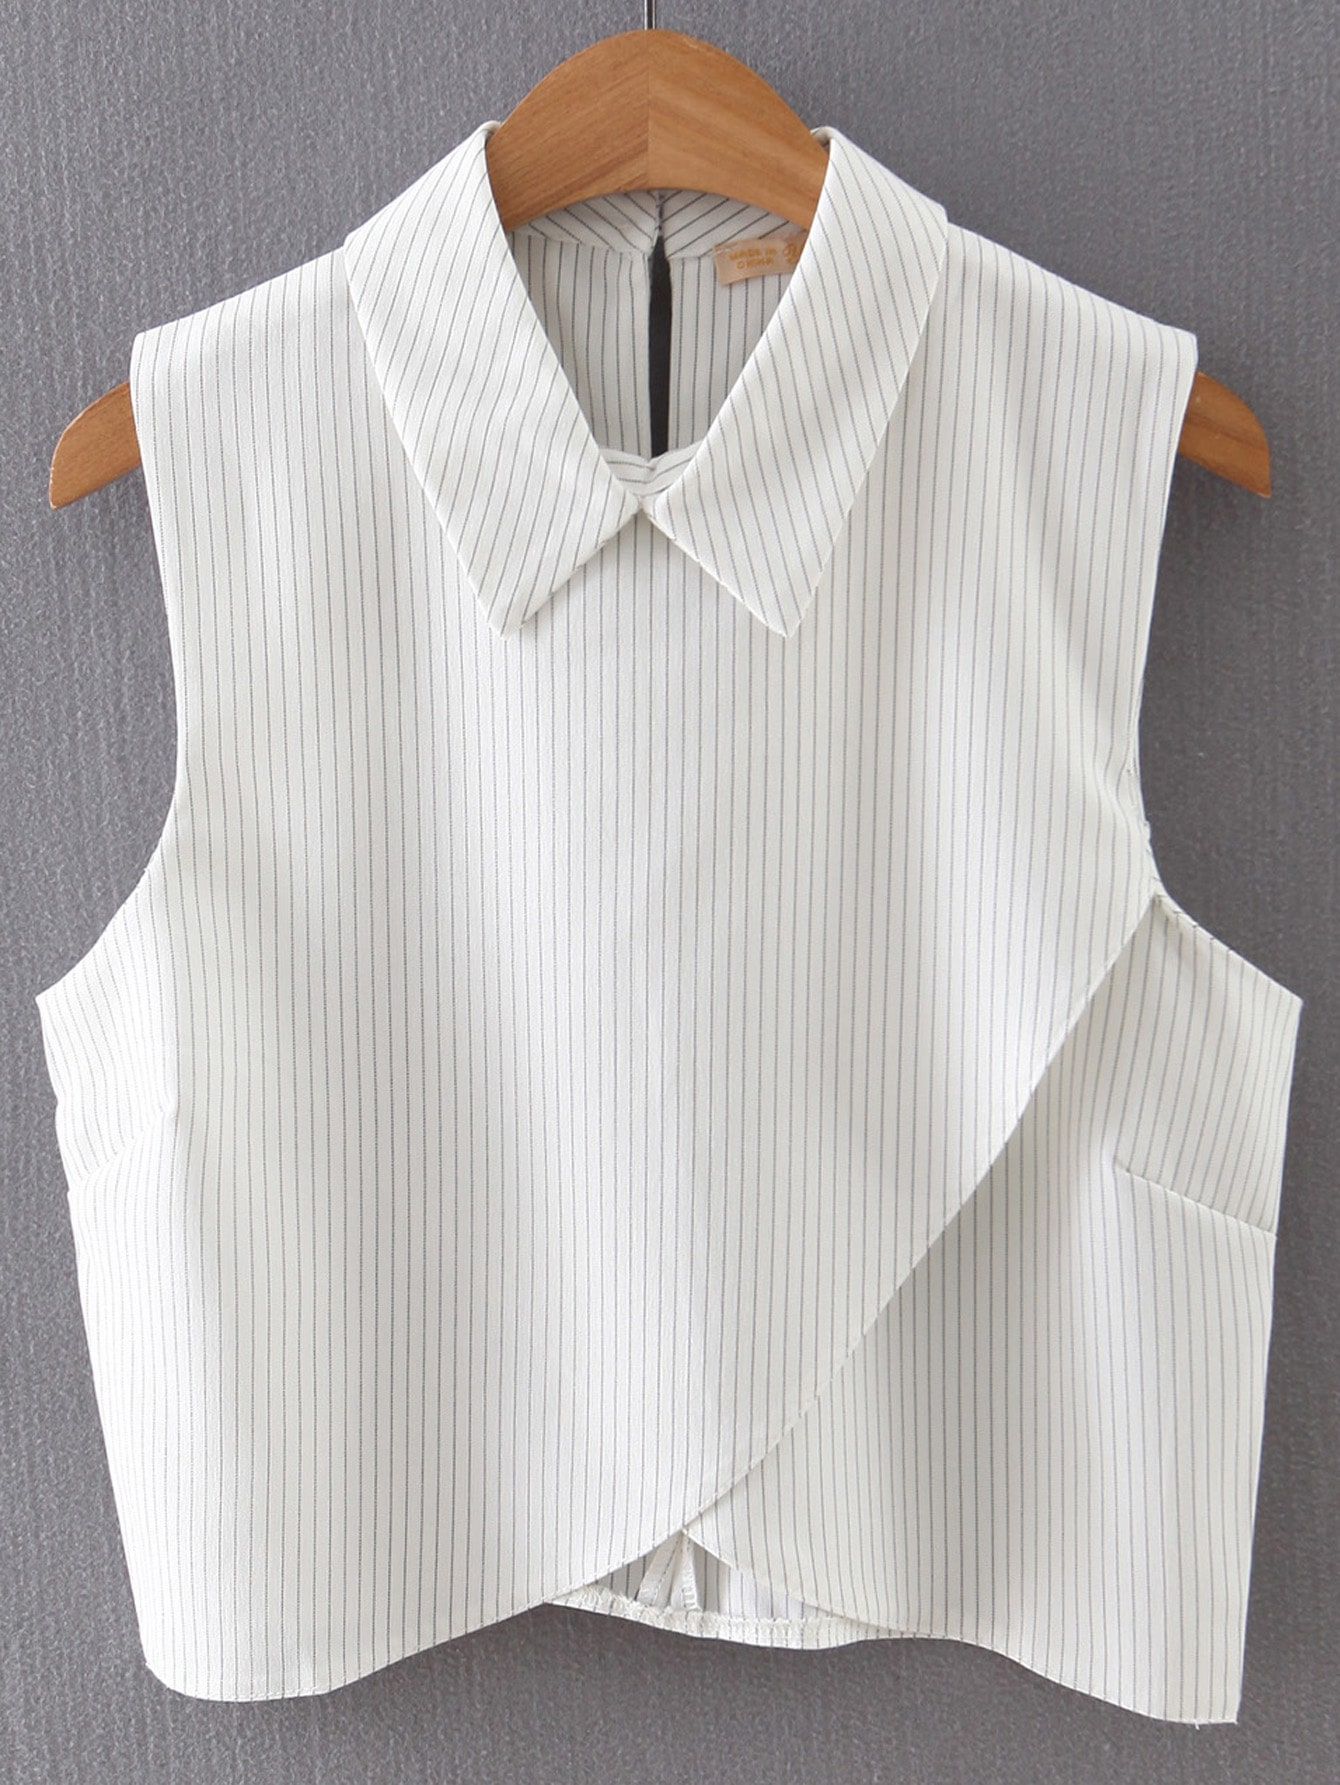 Vertical Striped Wrap White ShirtVertical Striped Wrap White Shirt<br><br>color: White<br>size: L,M,S